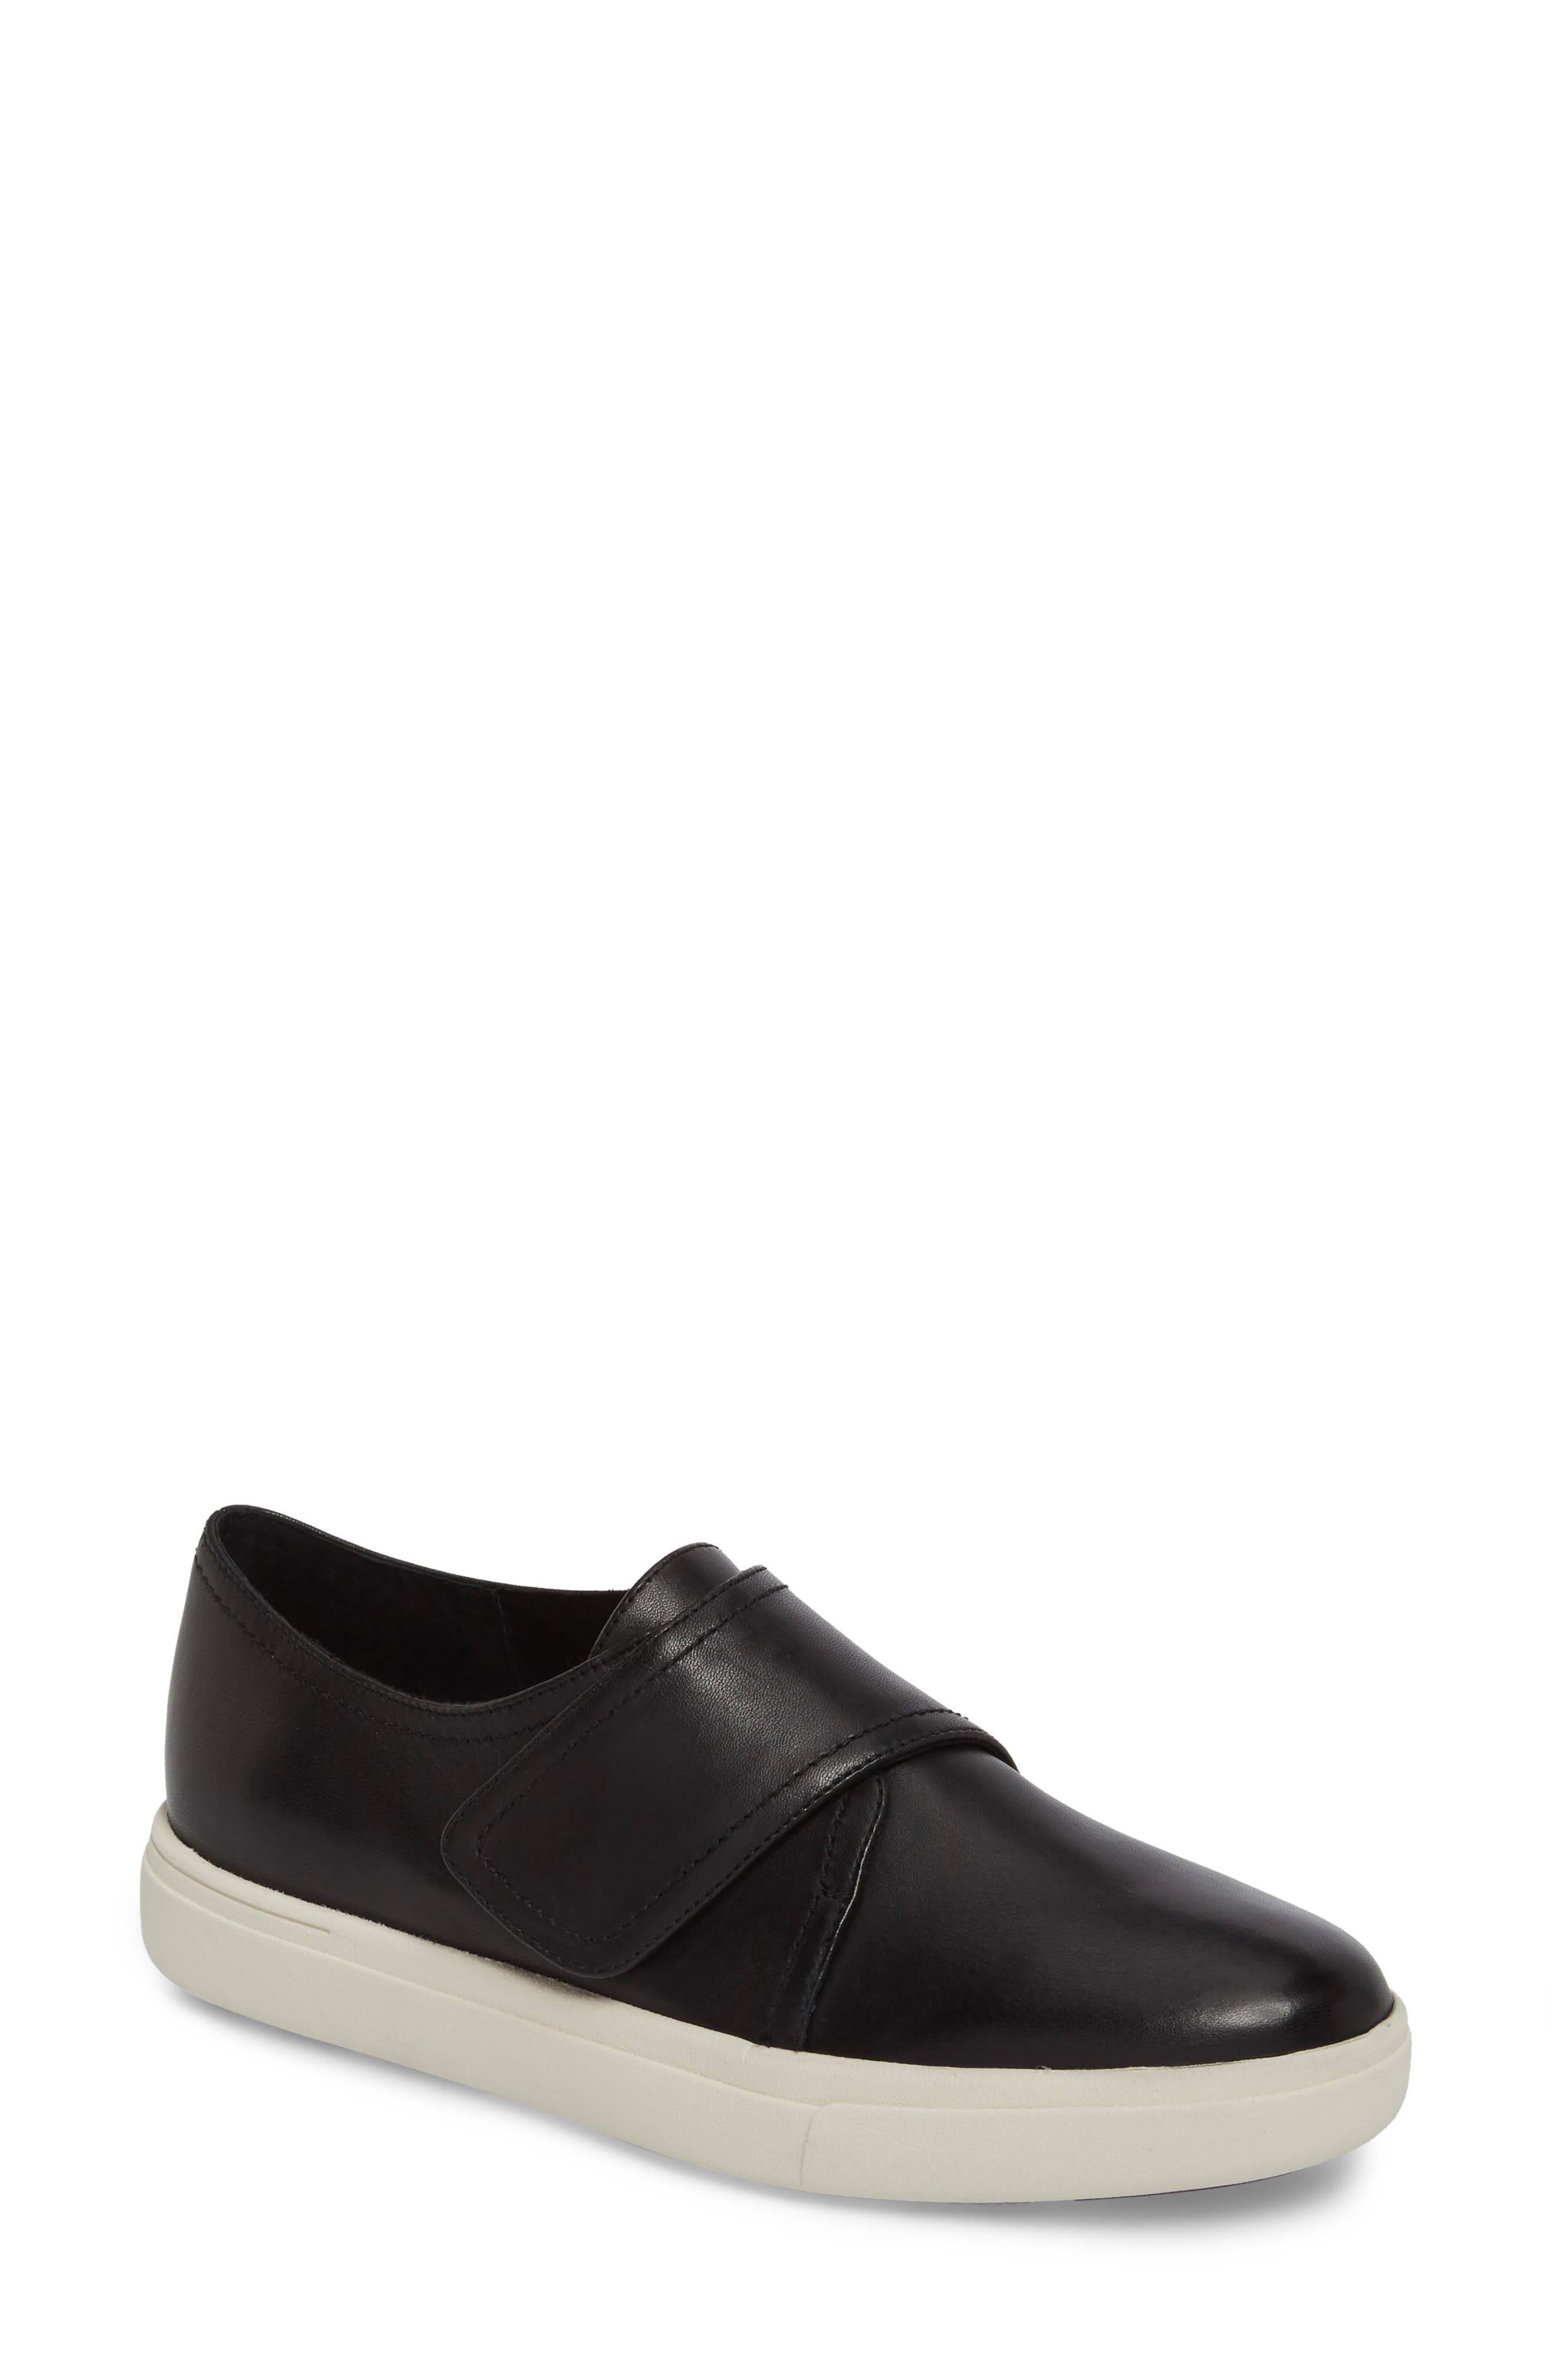 Oberon Slip-On Sneaker,                             Main thumbnail 1, color,                             Black Leather